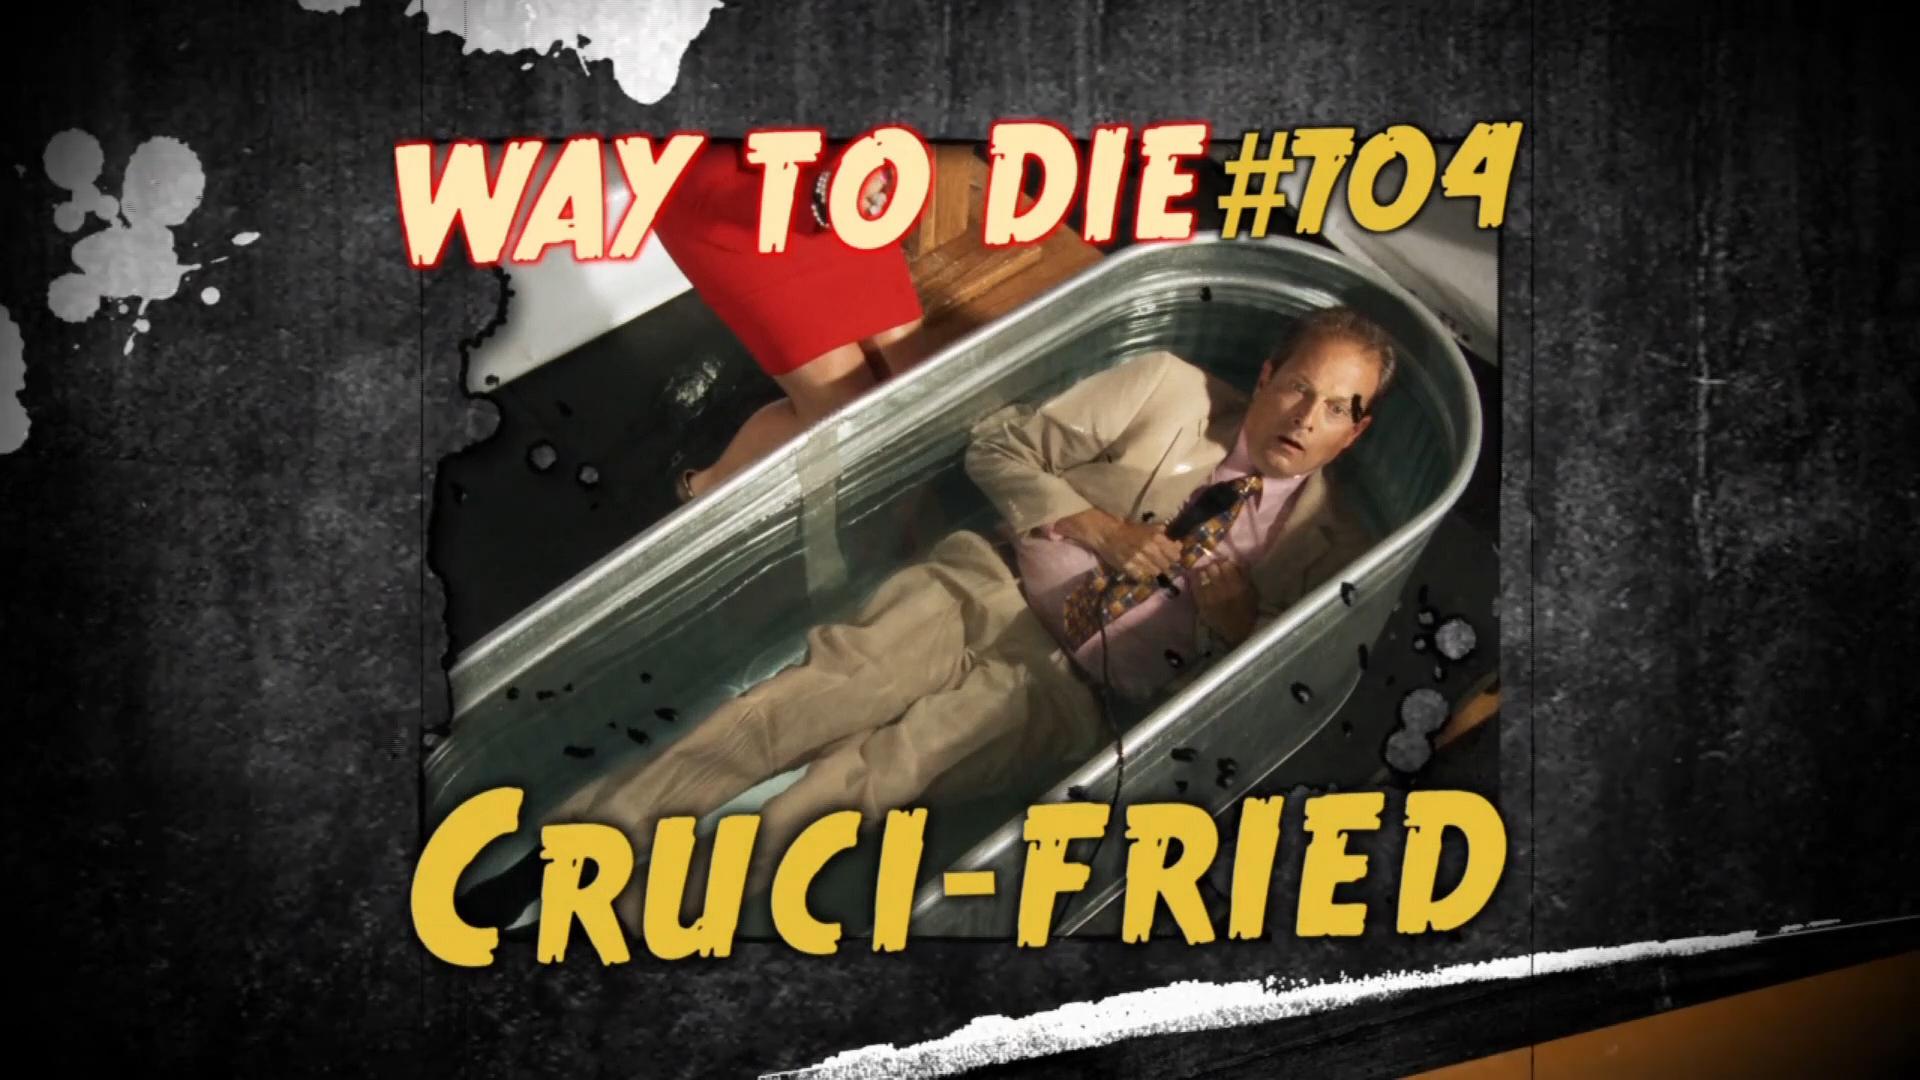 Cruci-Fried